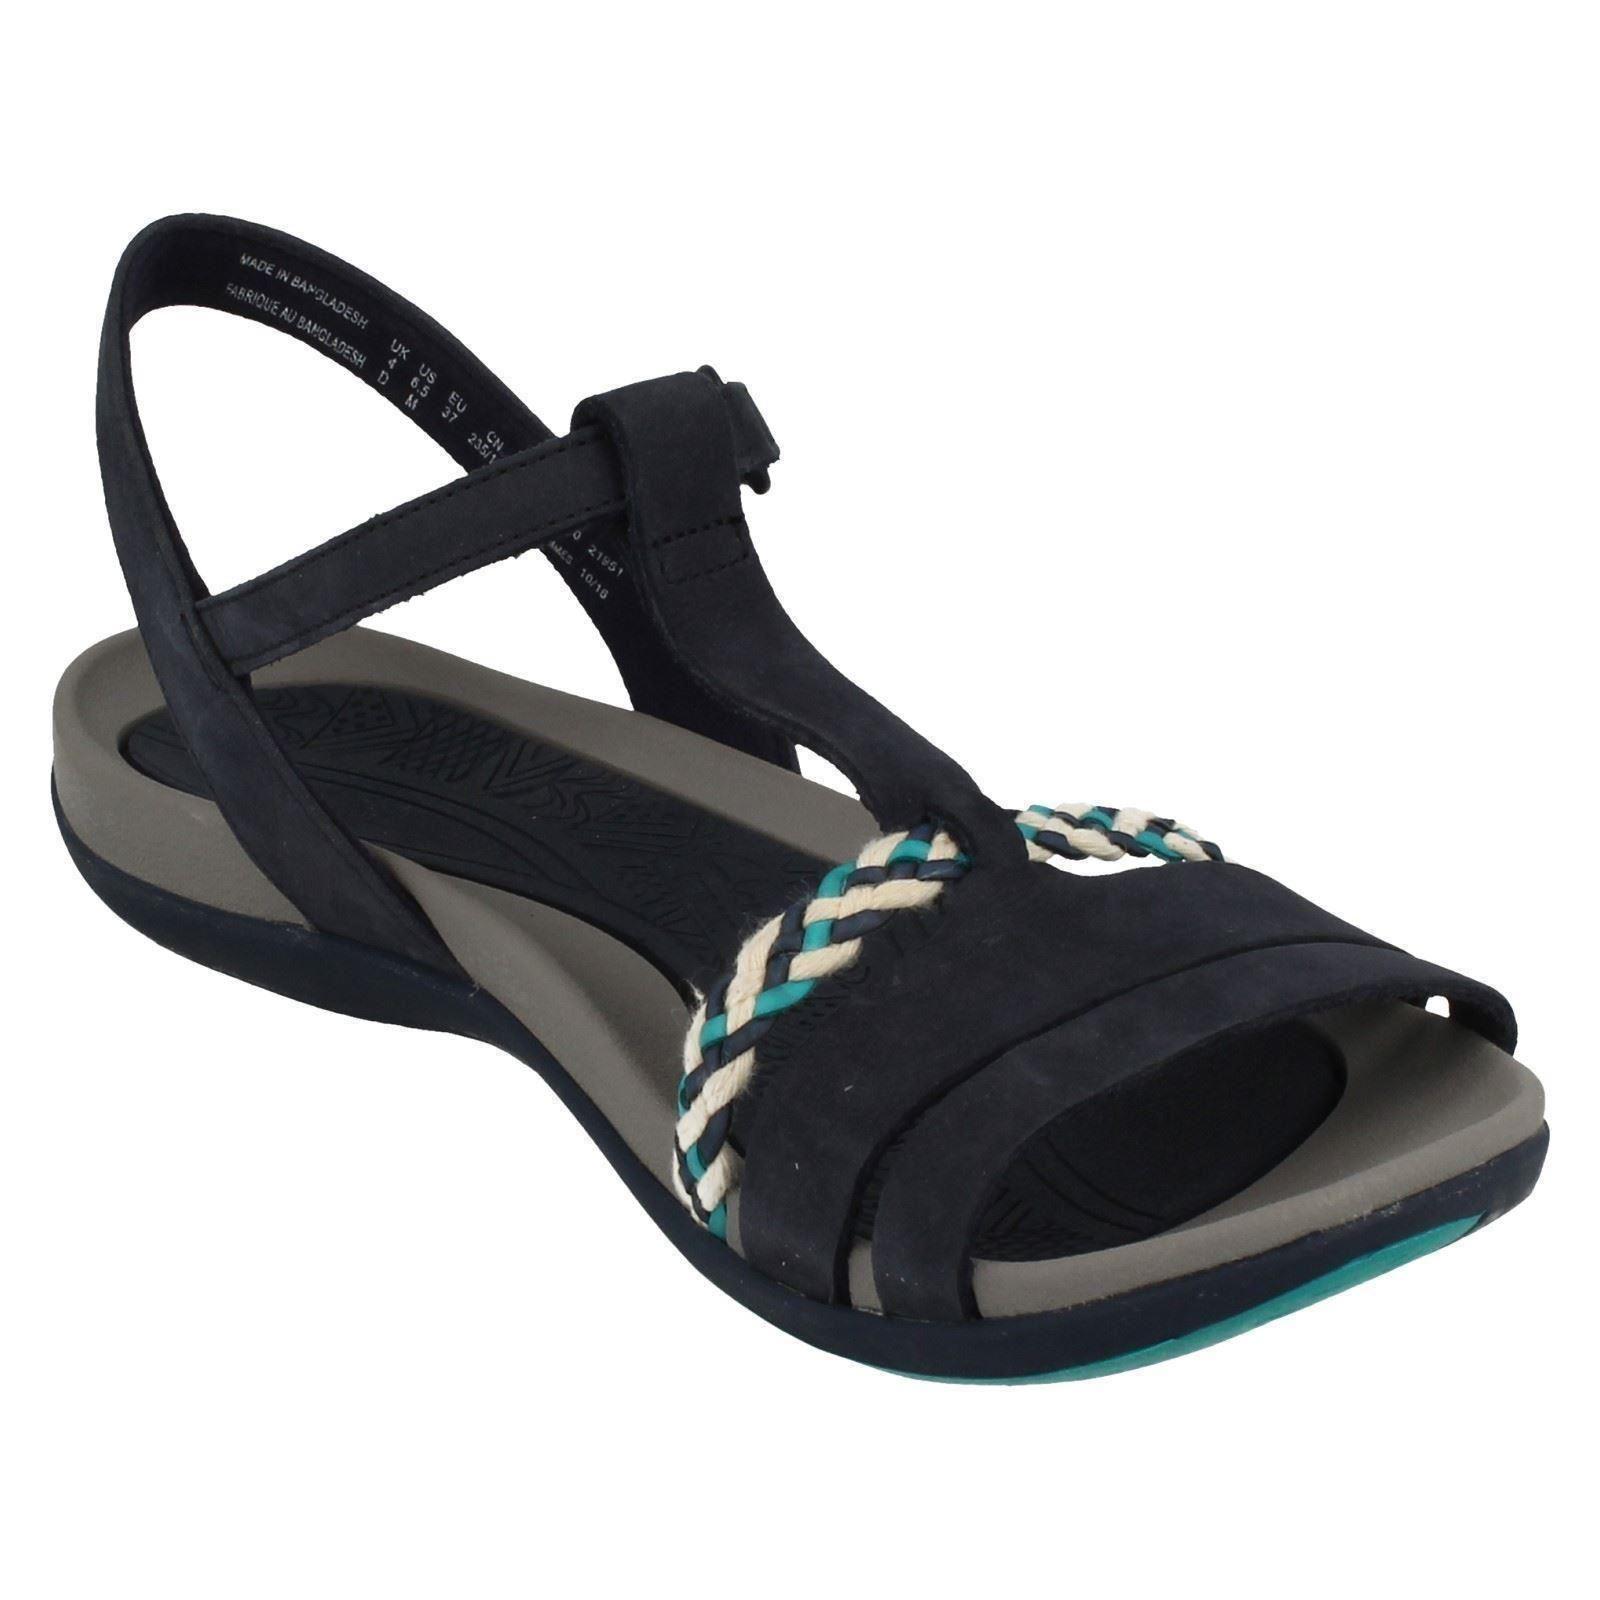 2737ae05e20f Ladies-Clarks-Casual-Summer-Sandals-Tealite-Grace thumbnail 21